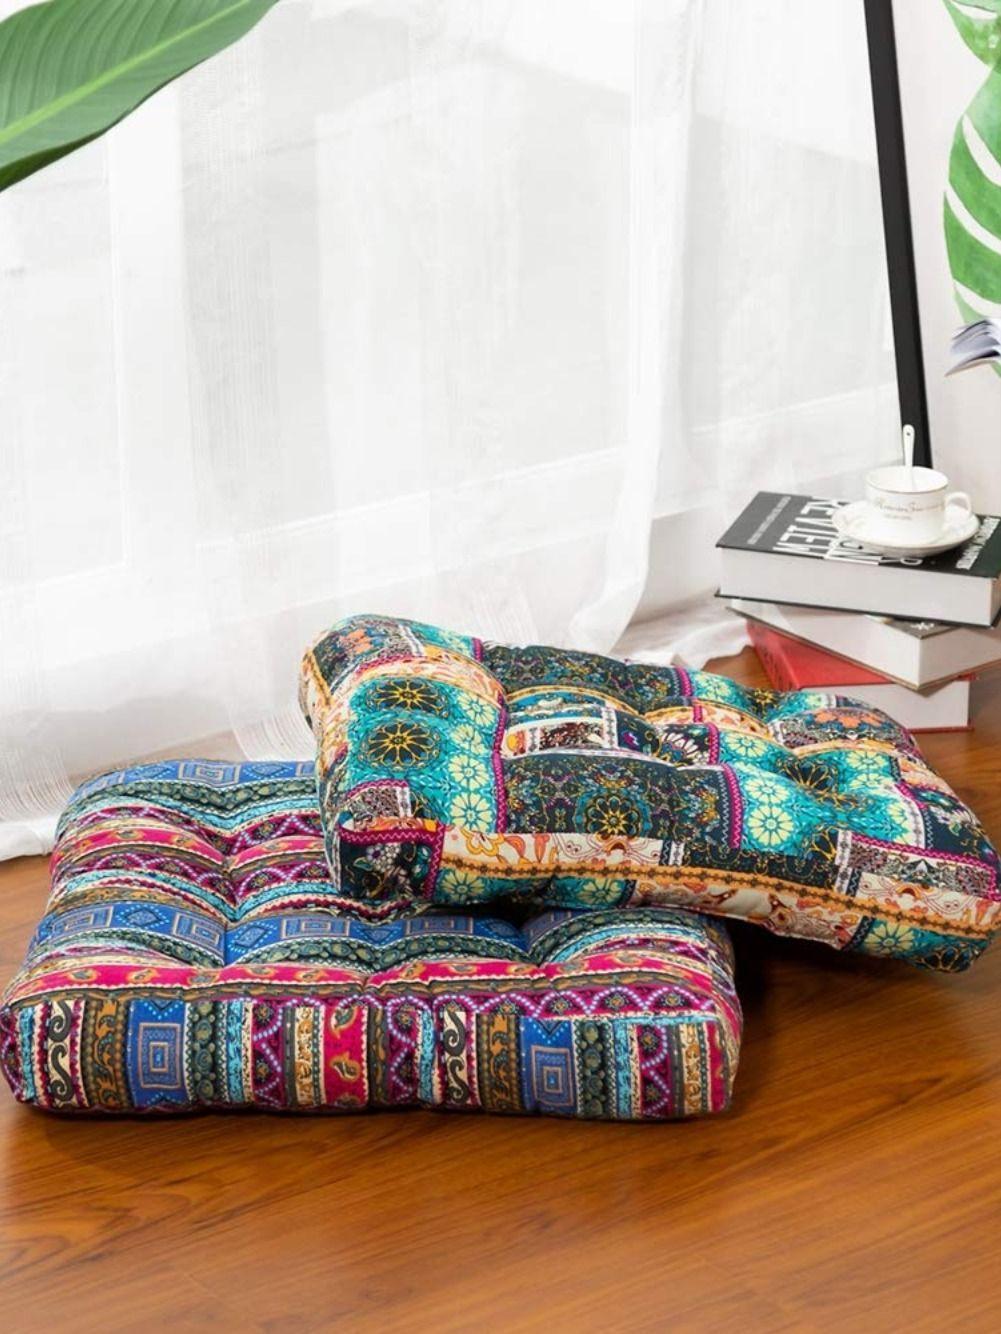 Boho Cushion Boho Cushion Large Pouf Cushion Mandala Floor Pillow Square Meditation Yoga Seating Cushion Boho Cushions Indian Cushions Floor Pillows